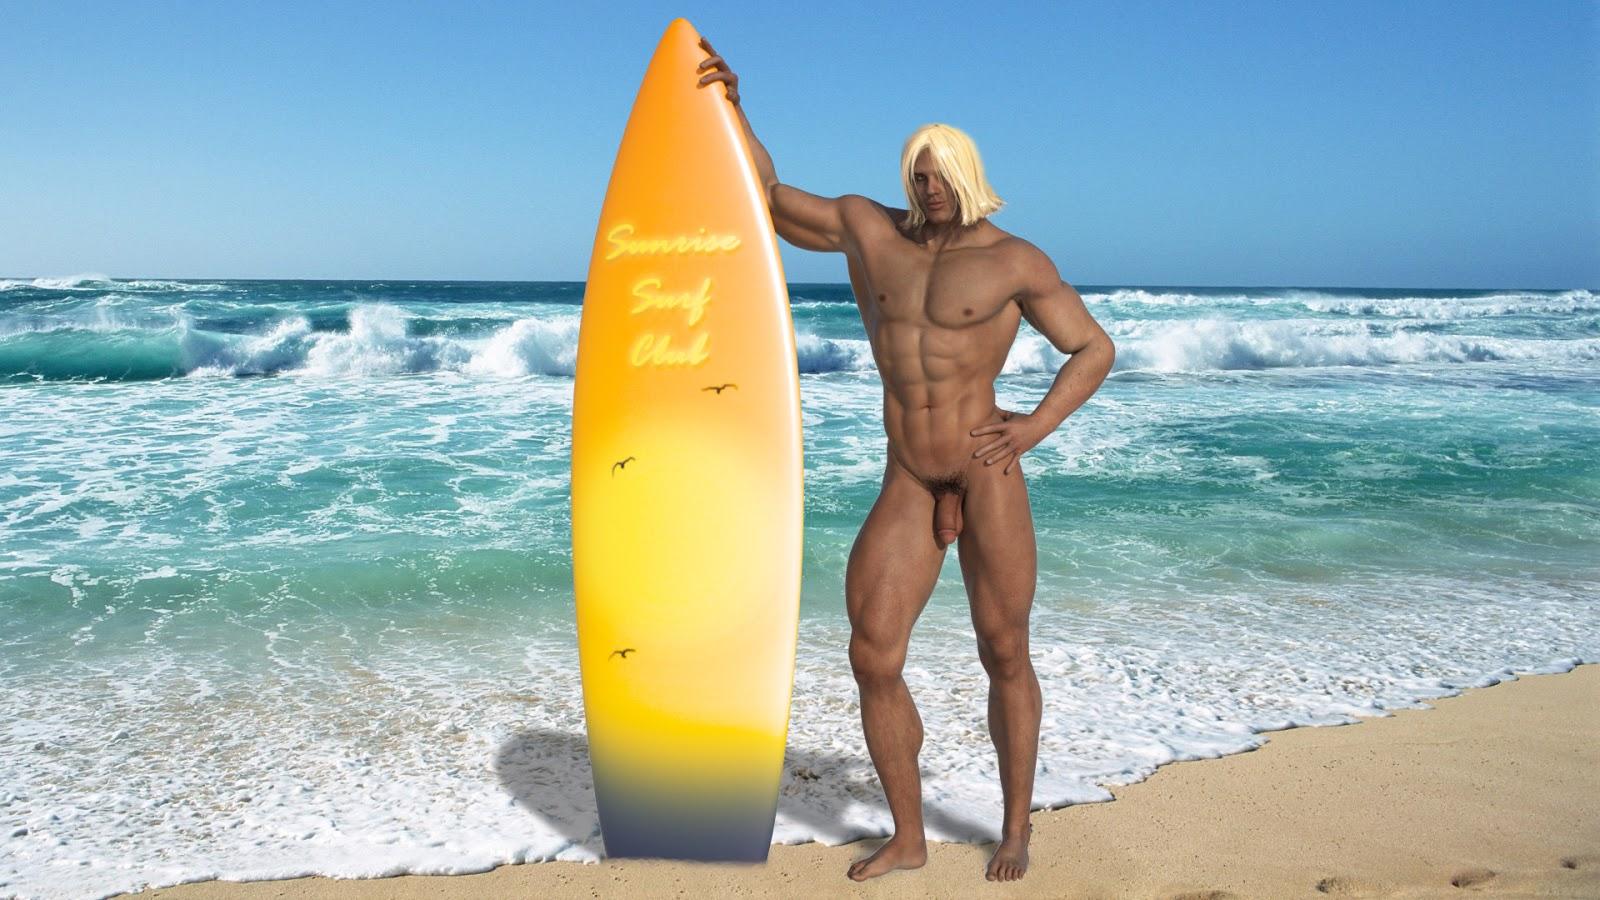 Gay naked surfer dudes